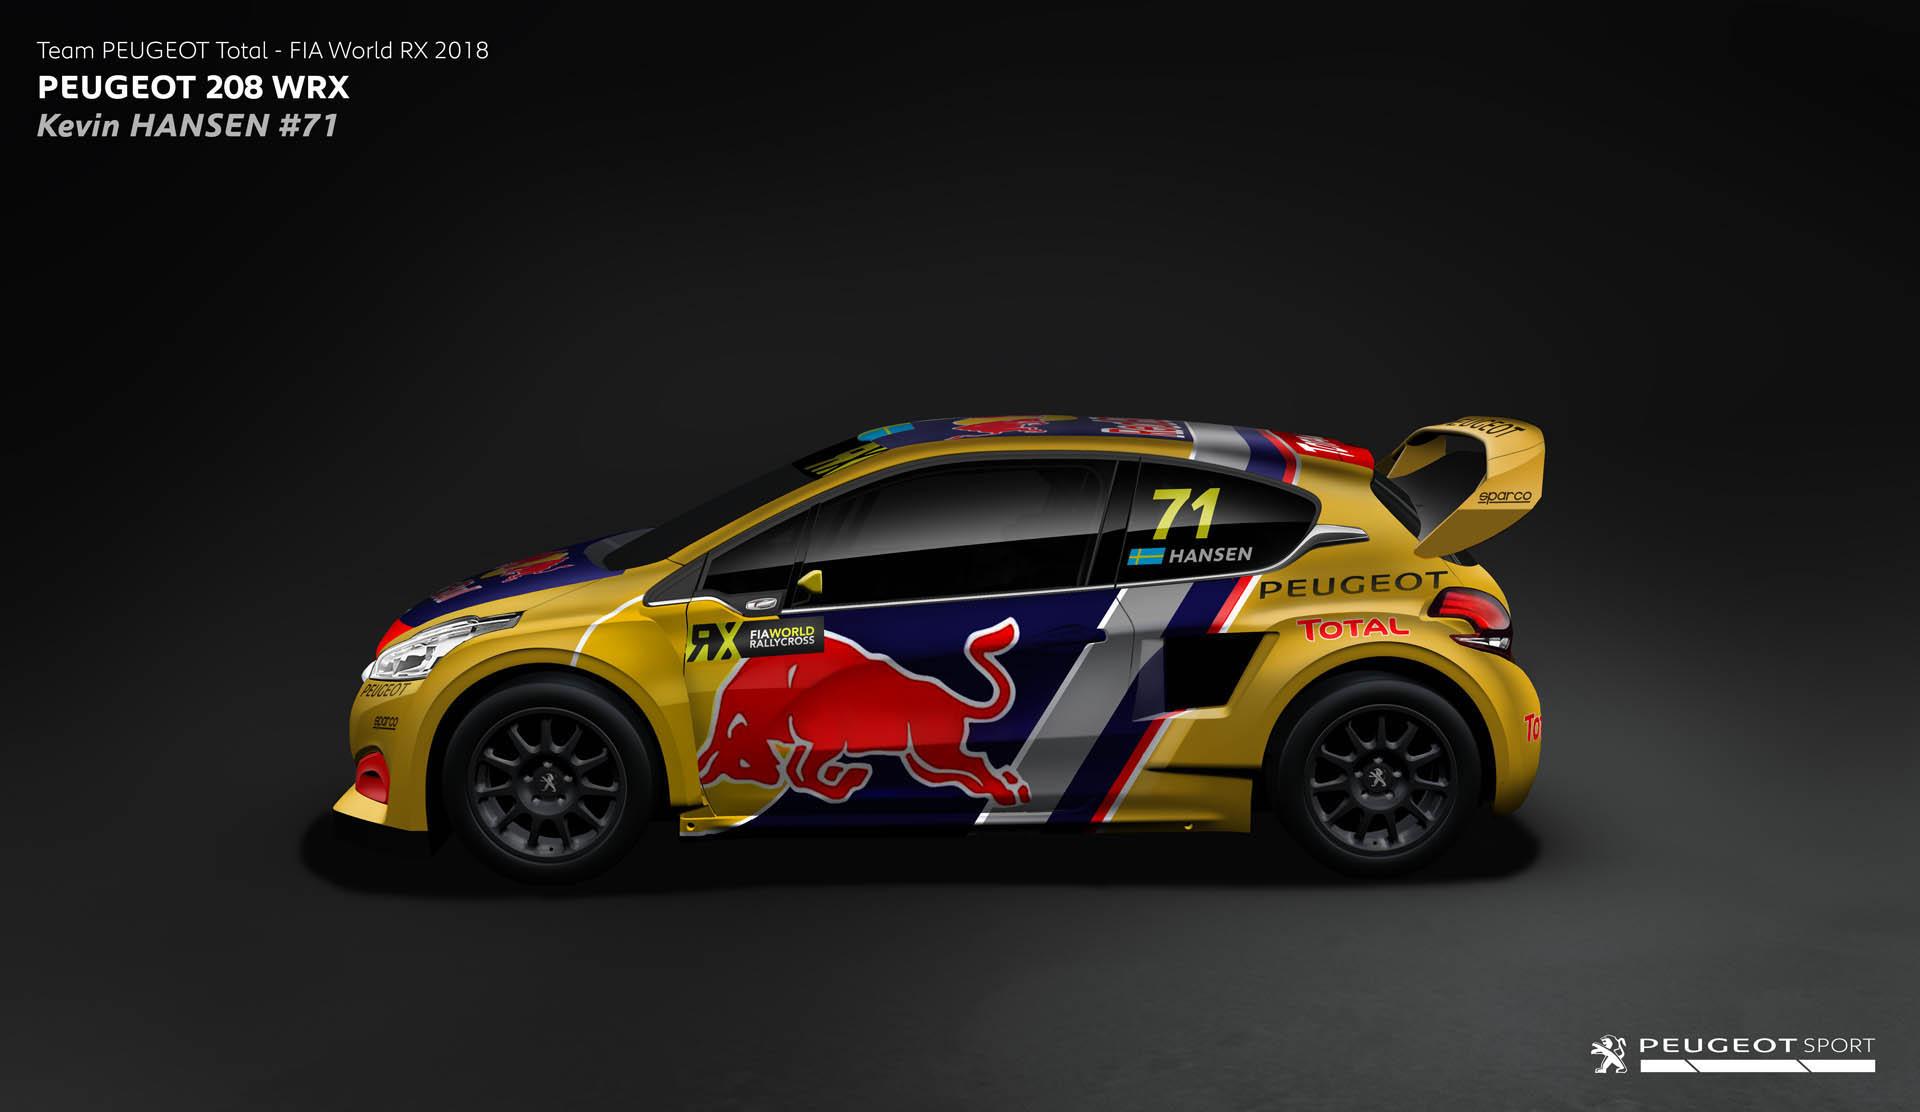 Peugeot 208 WRX 2018 (3)